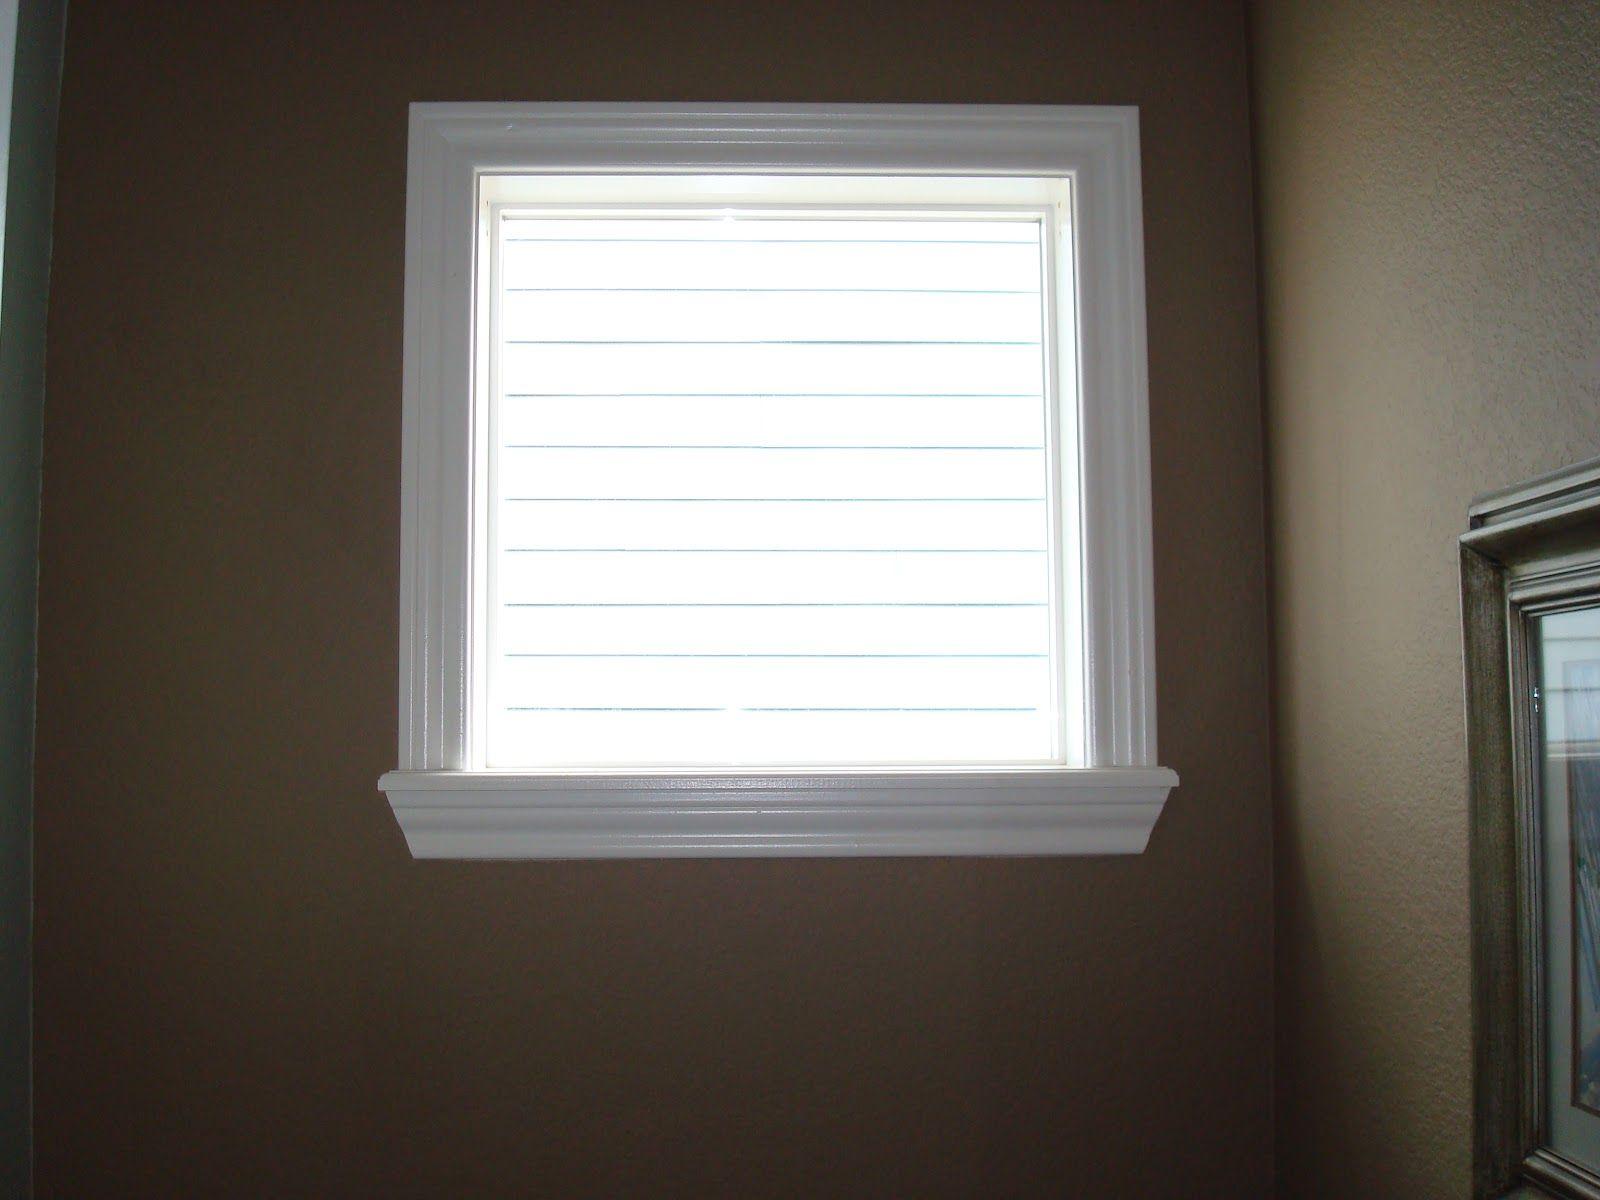 Badezimmer Fenster Behandlungen Badezimmer Ohne Fenster Badezimmer Vorhang Kleine Fenster